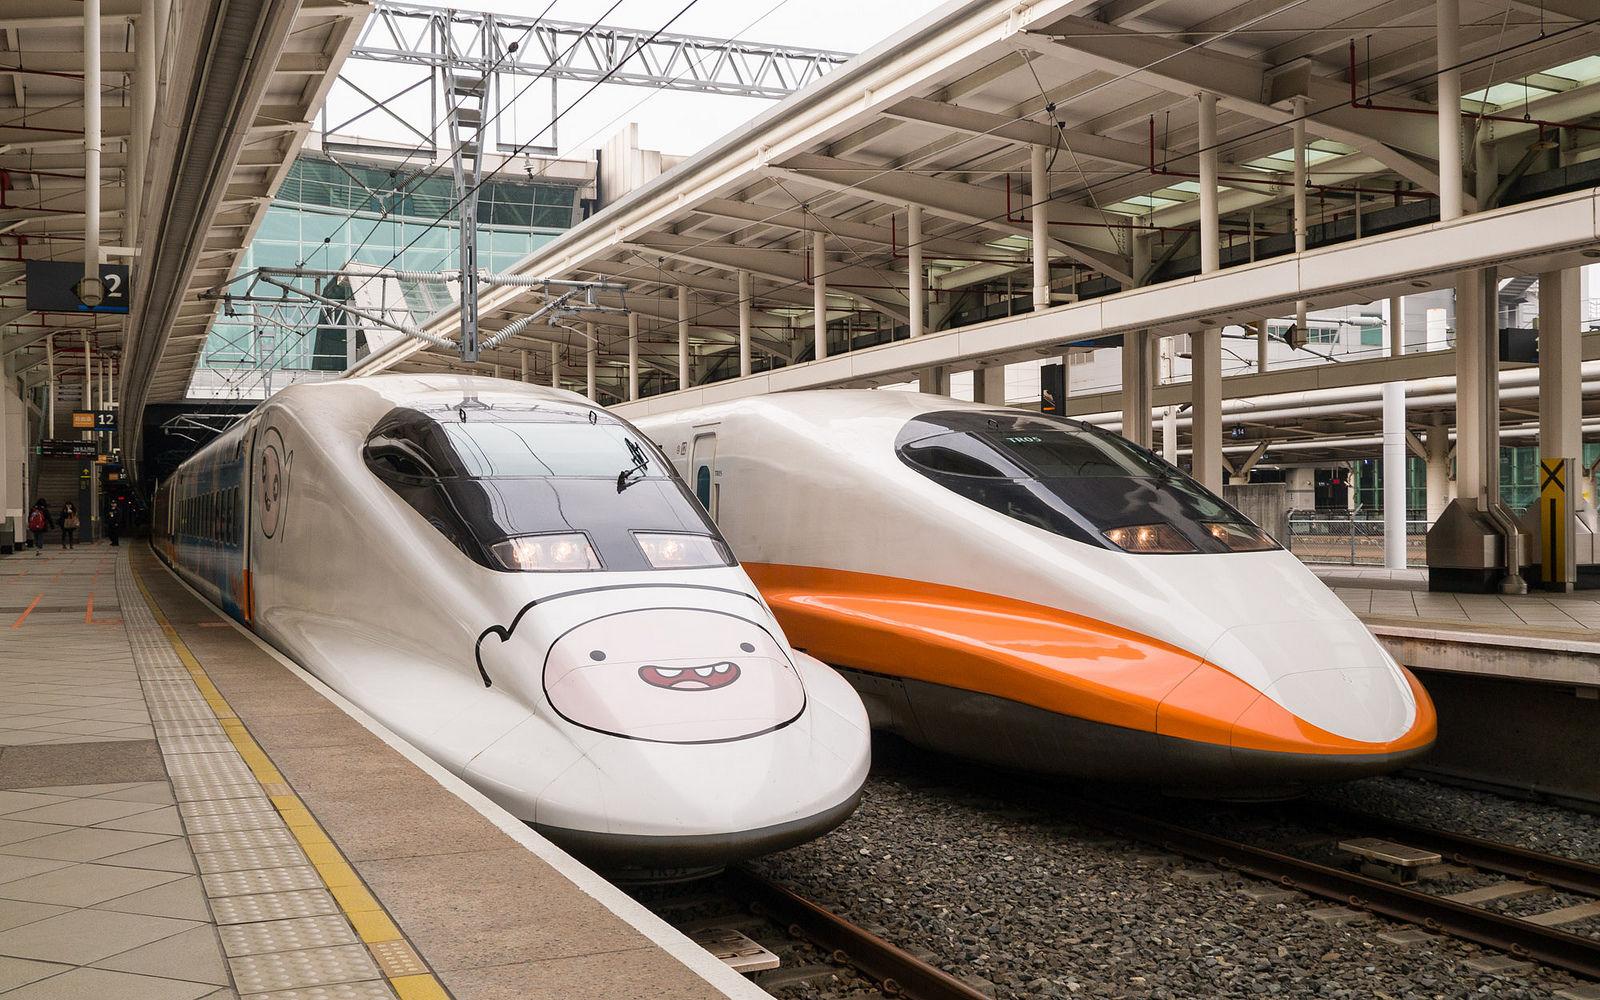 Taiwan High Speed Rail Discount Ticket from Taipei